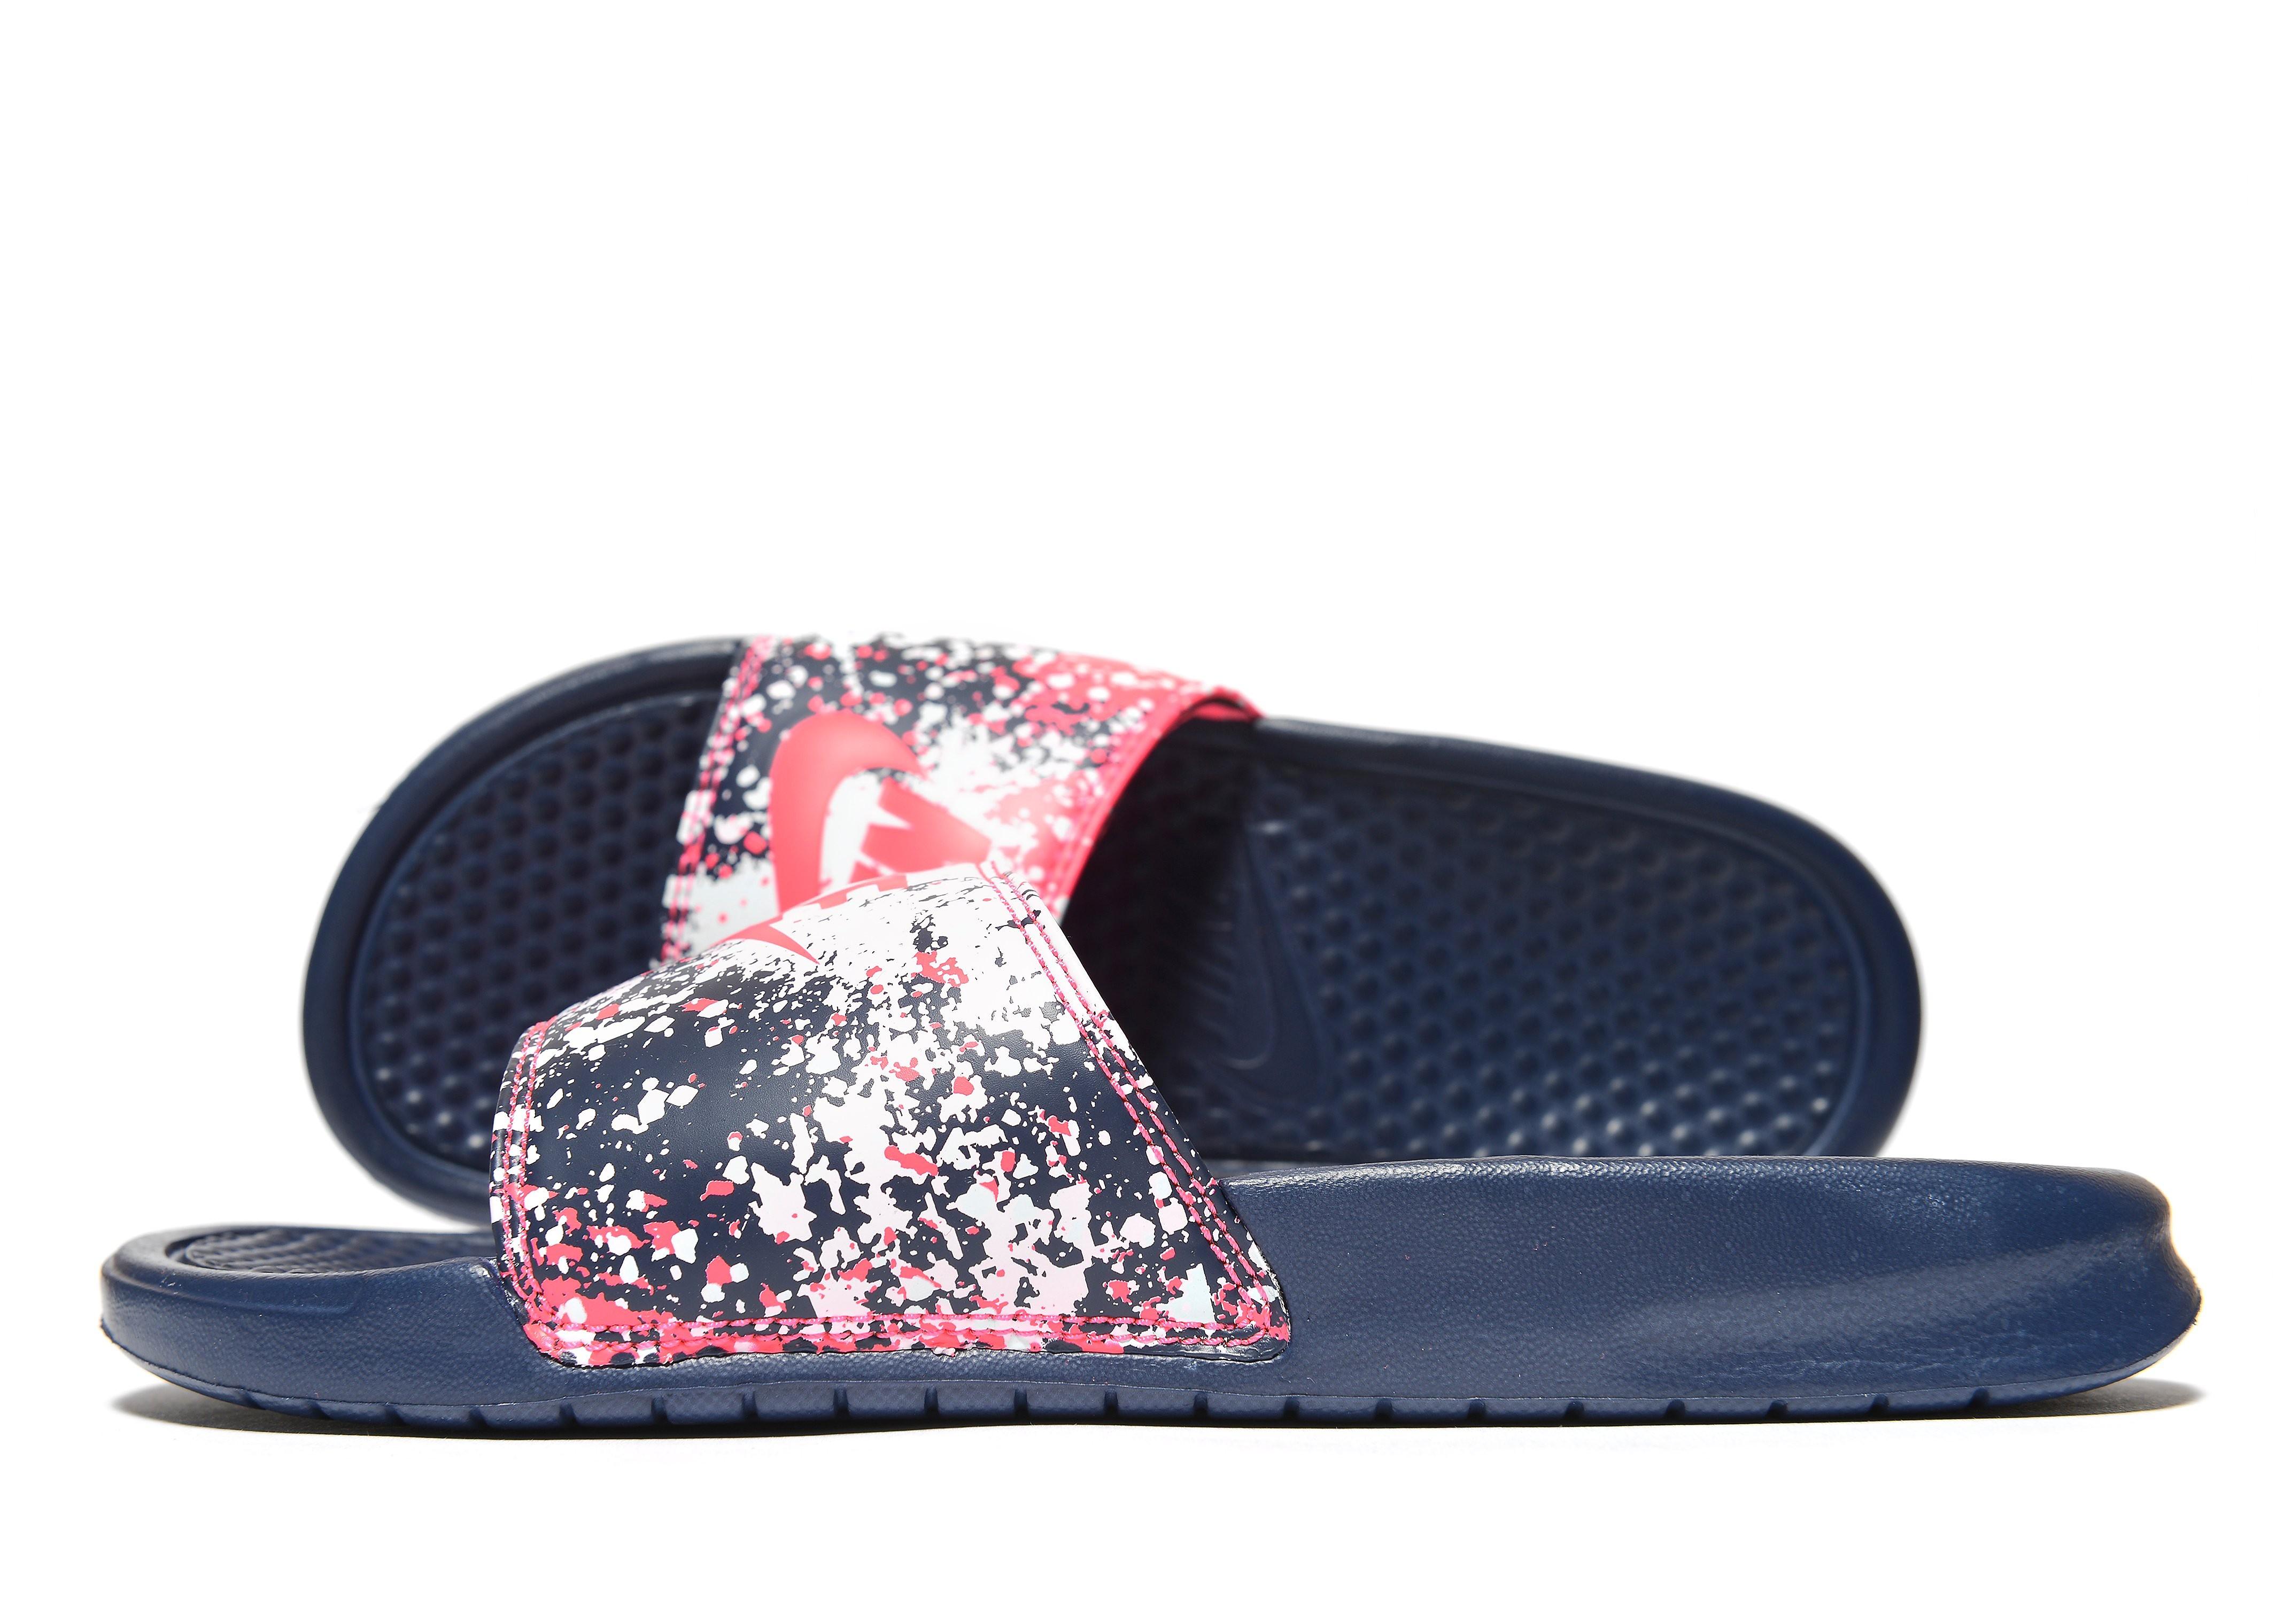 Nike Benassi Print Slides Women's